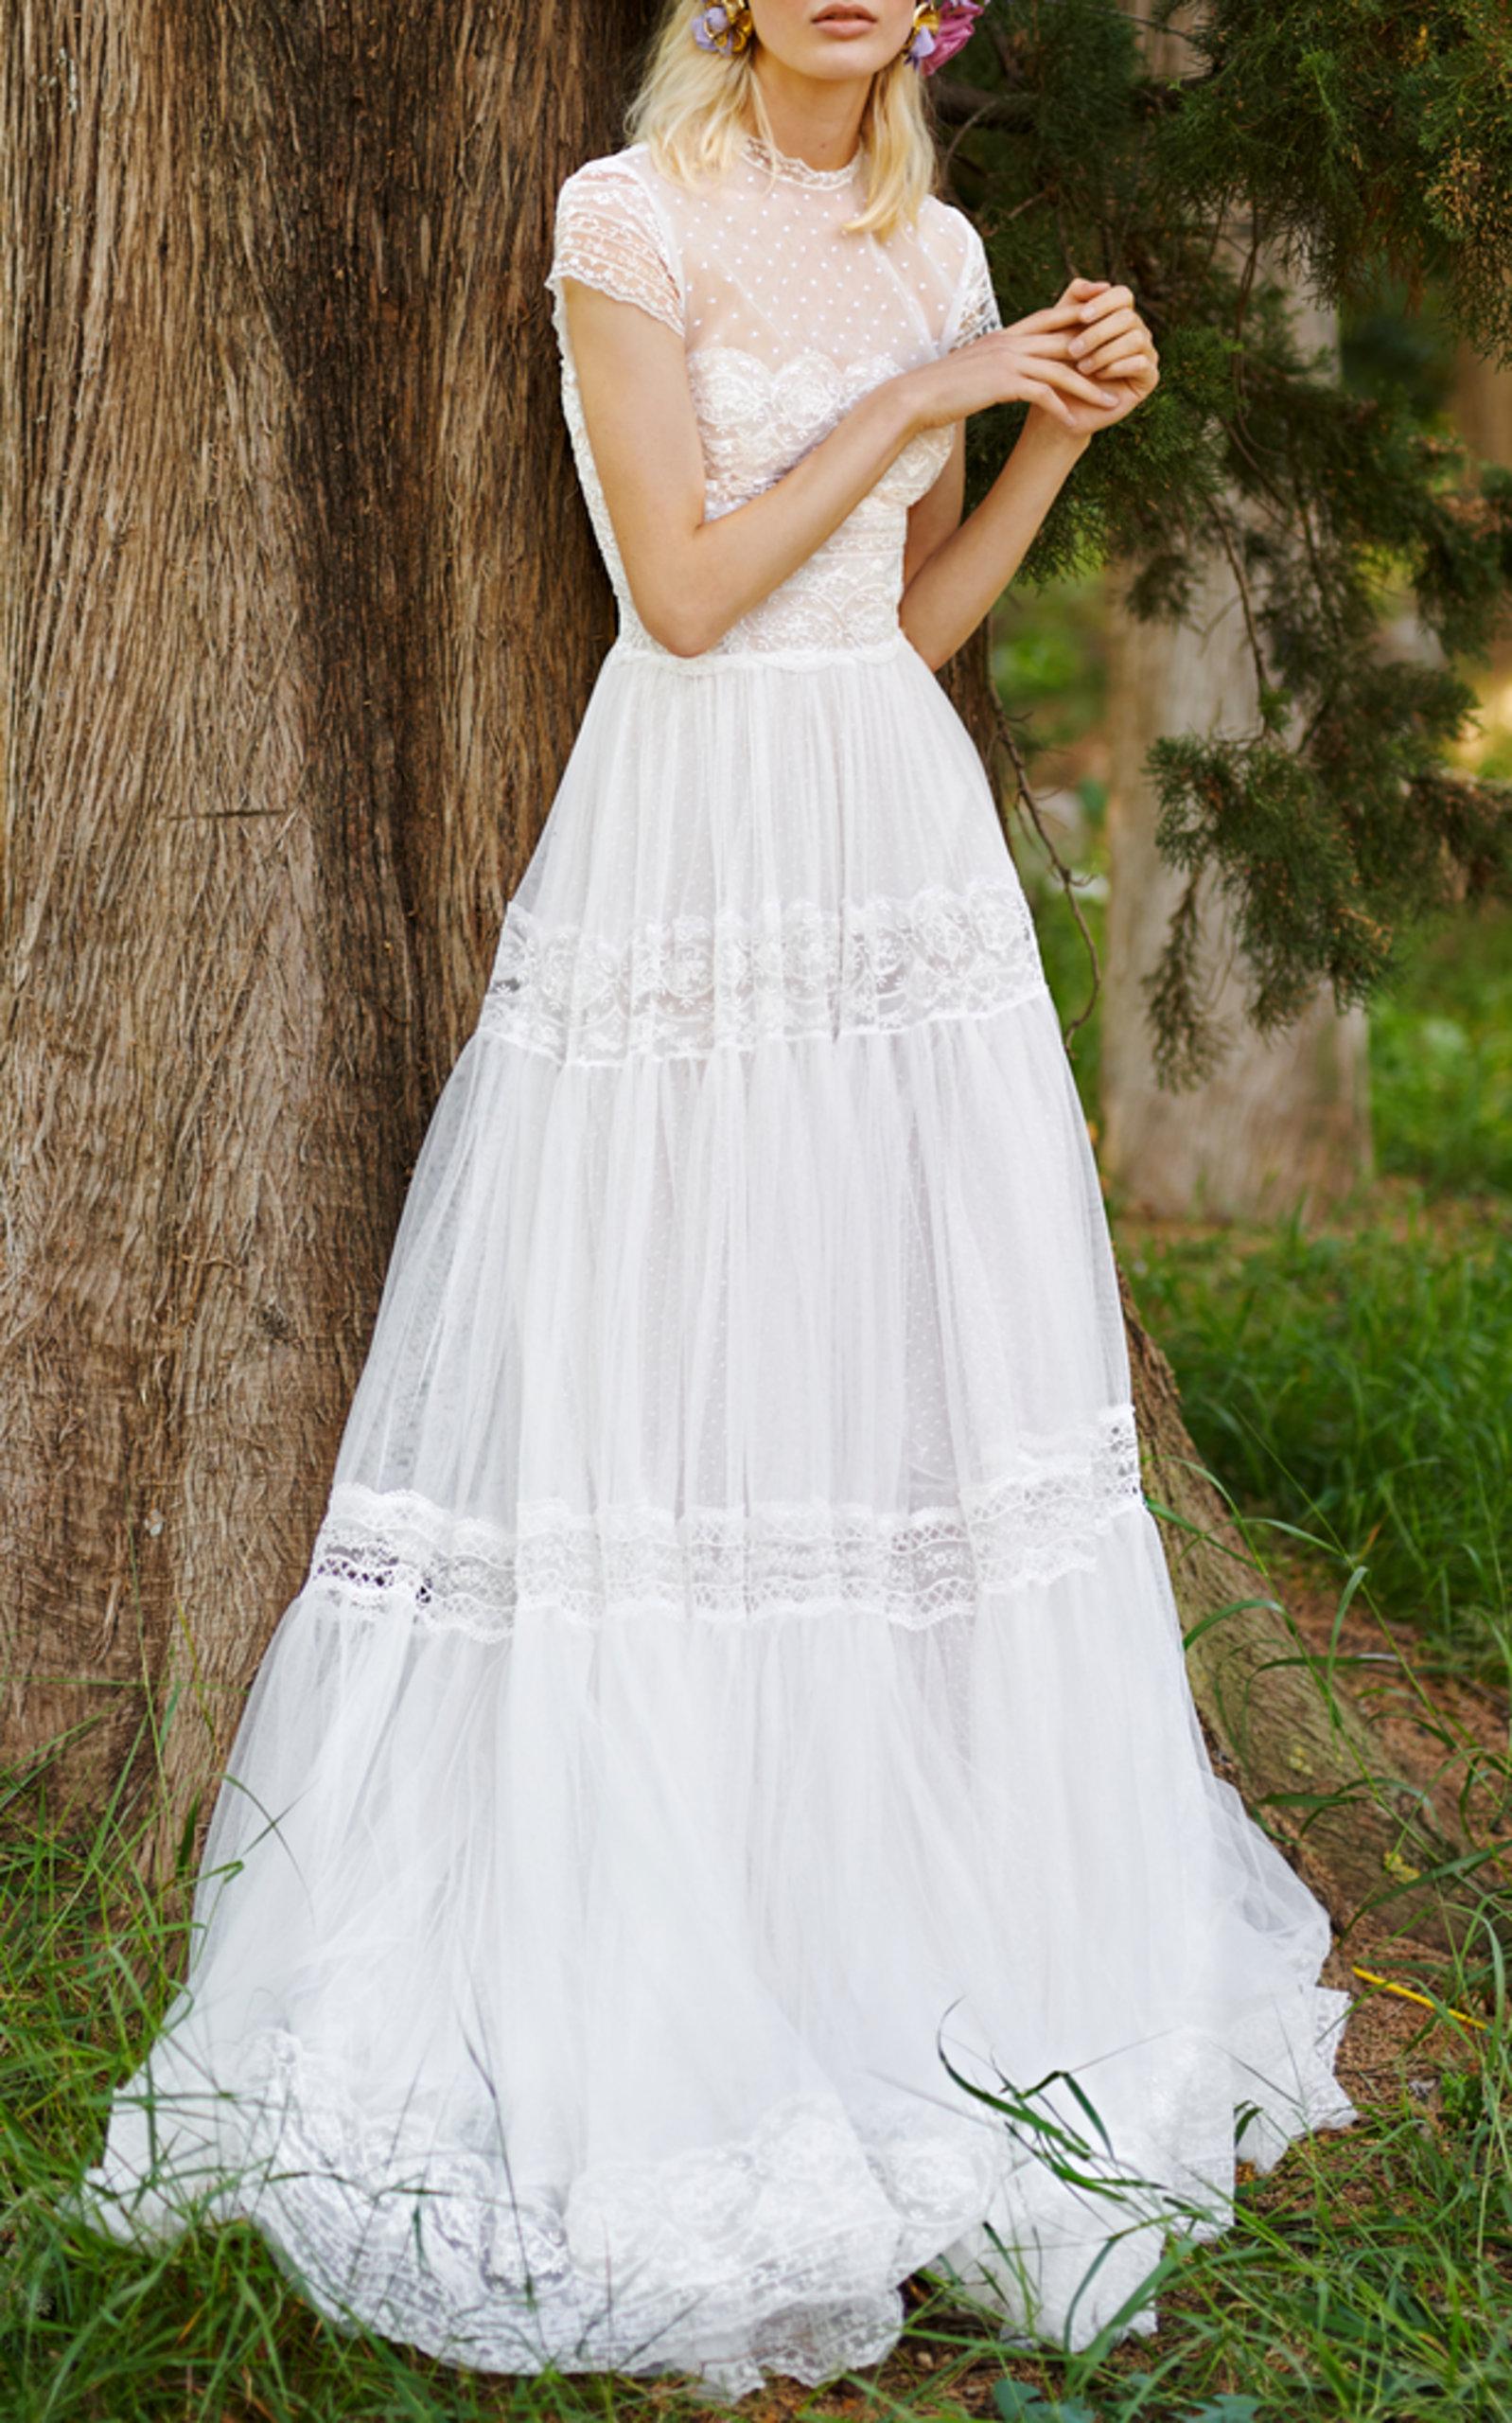 COSTARELLOS BRIDAL FIT & FLARE TULLE DRESS